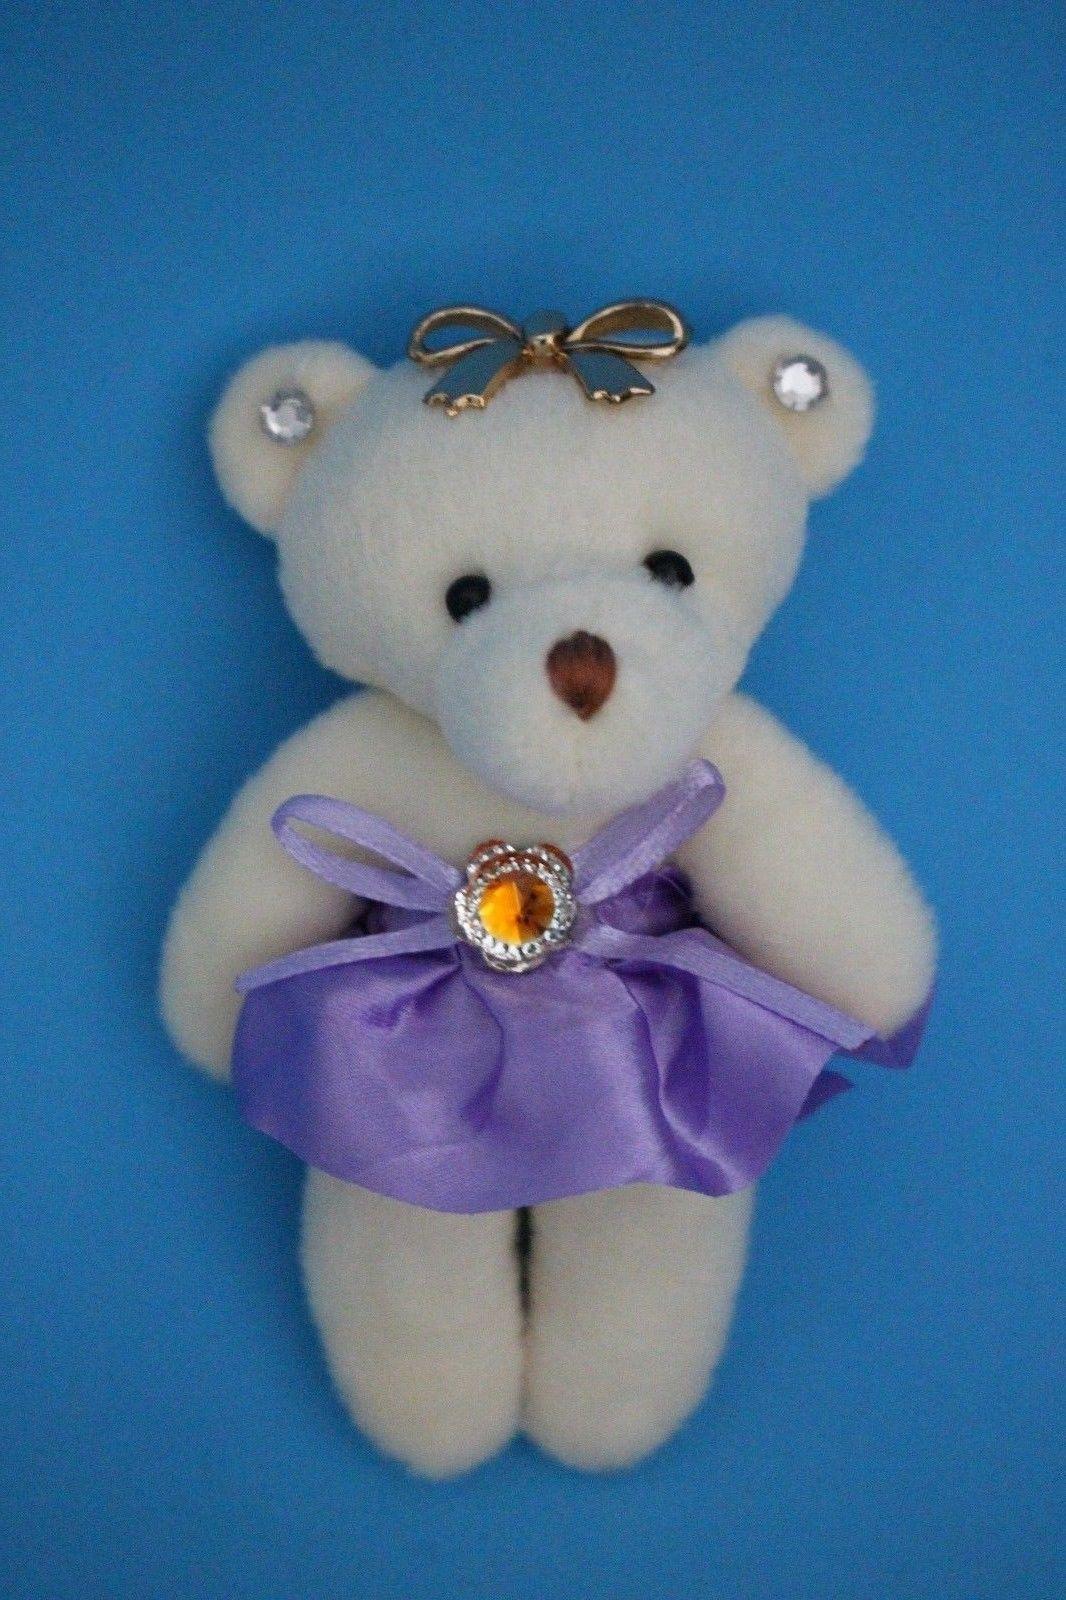 1 Dozen Wooden roses bouquet(White + Orange)-- Special Gift for Her w/ Free Bear